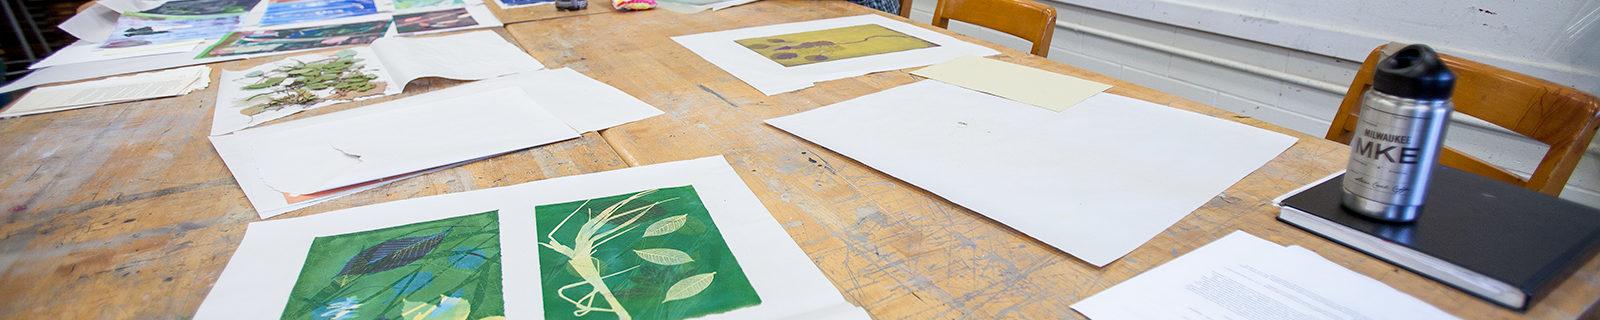 Prints in art classroom.